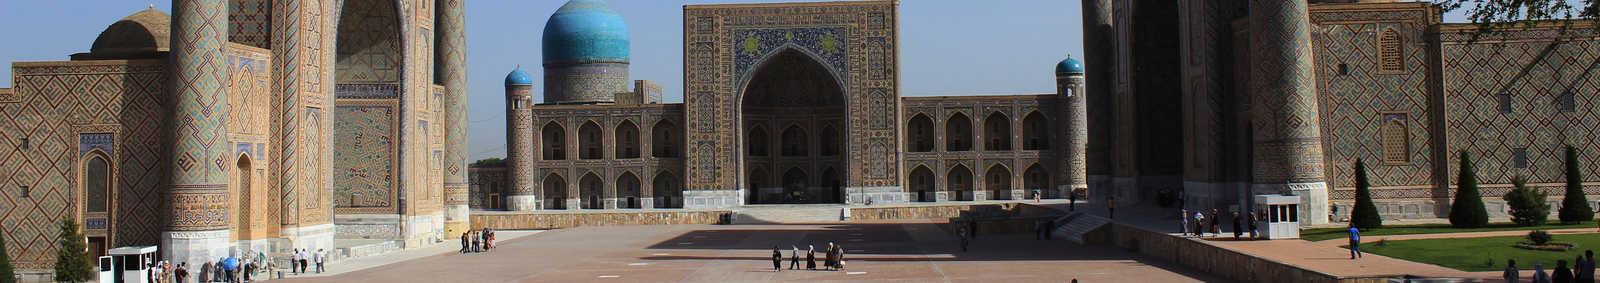 Registan Square, Uzbekistan